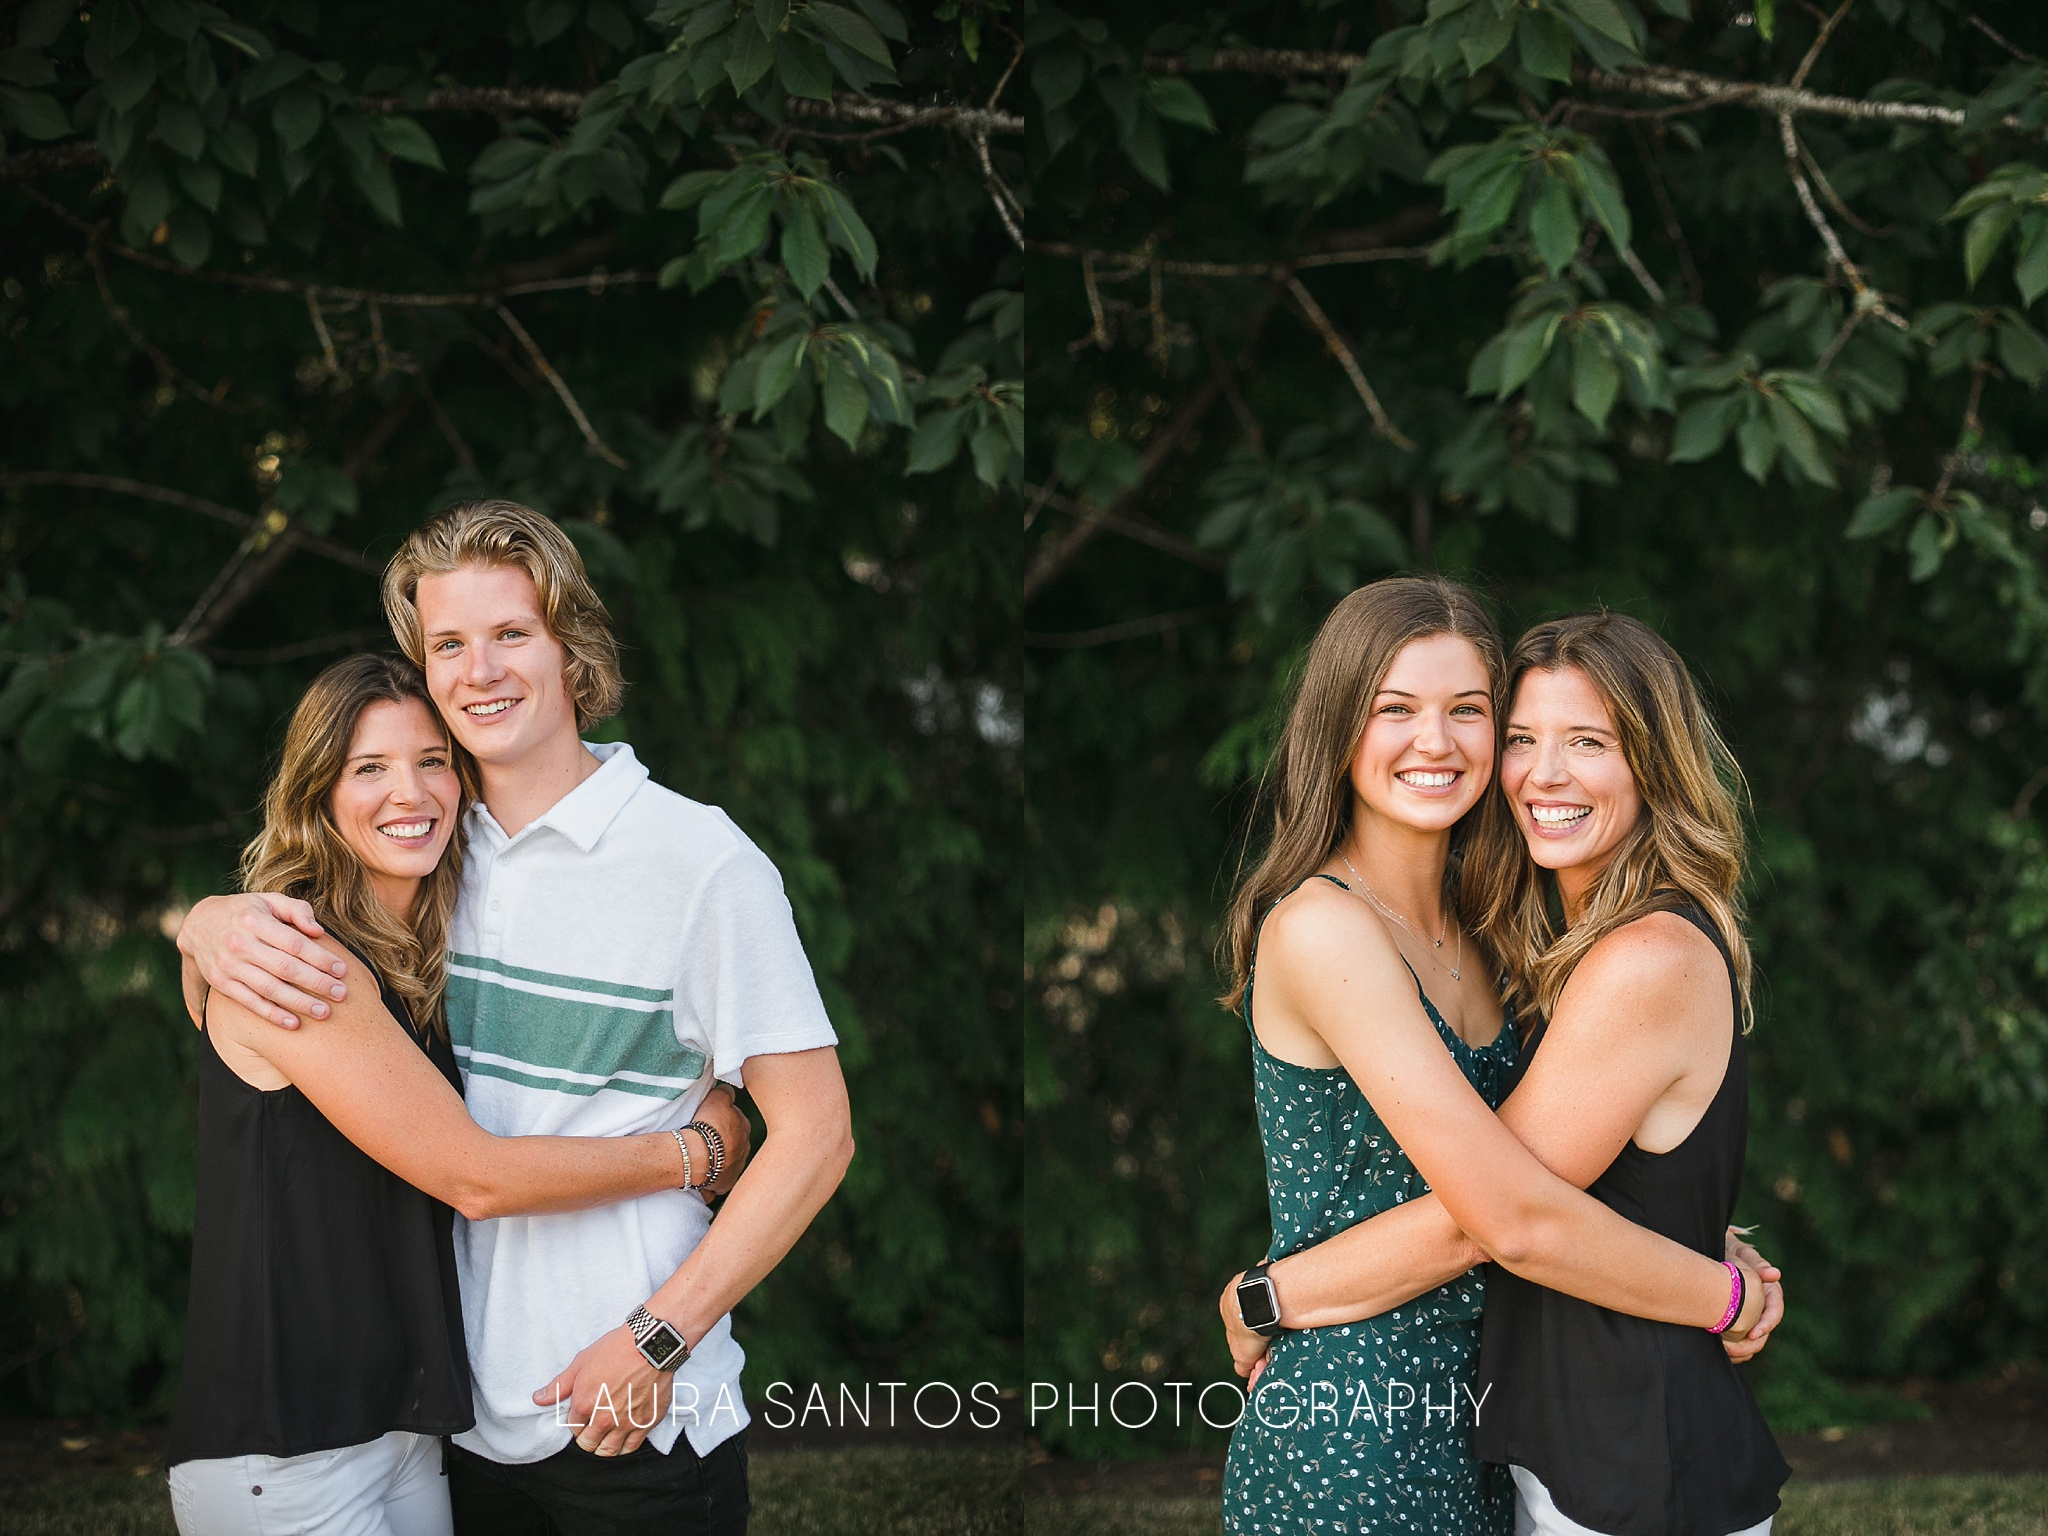 Laura Santos Photography Portland Oregon Family Photographer_0253.jpg